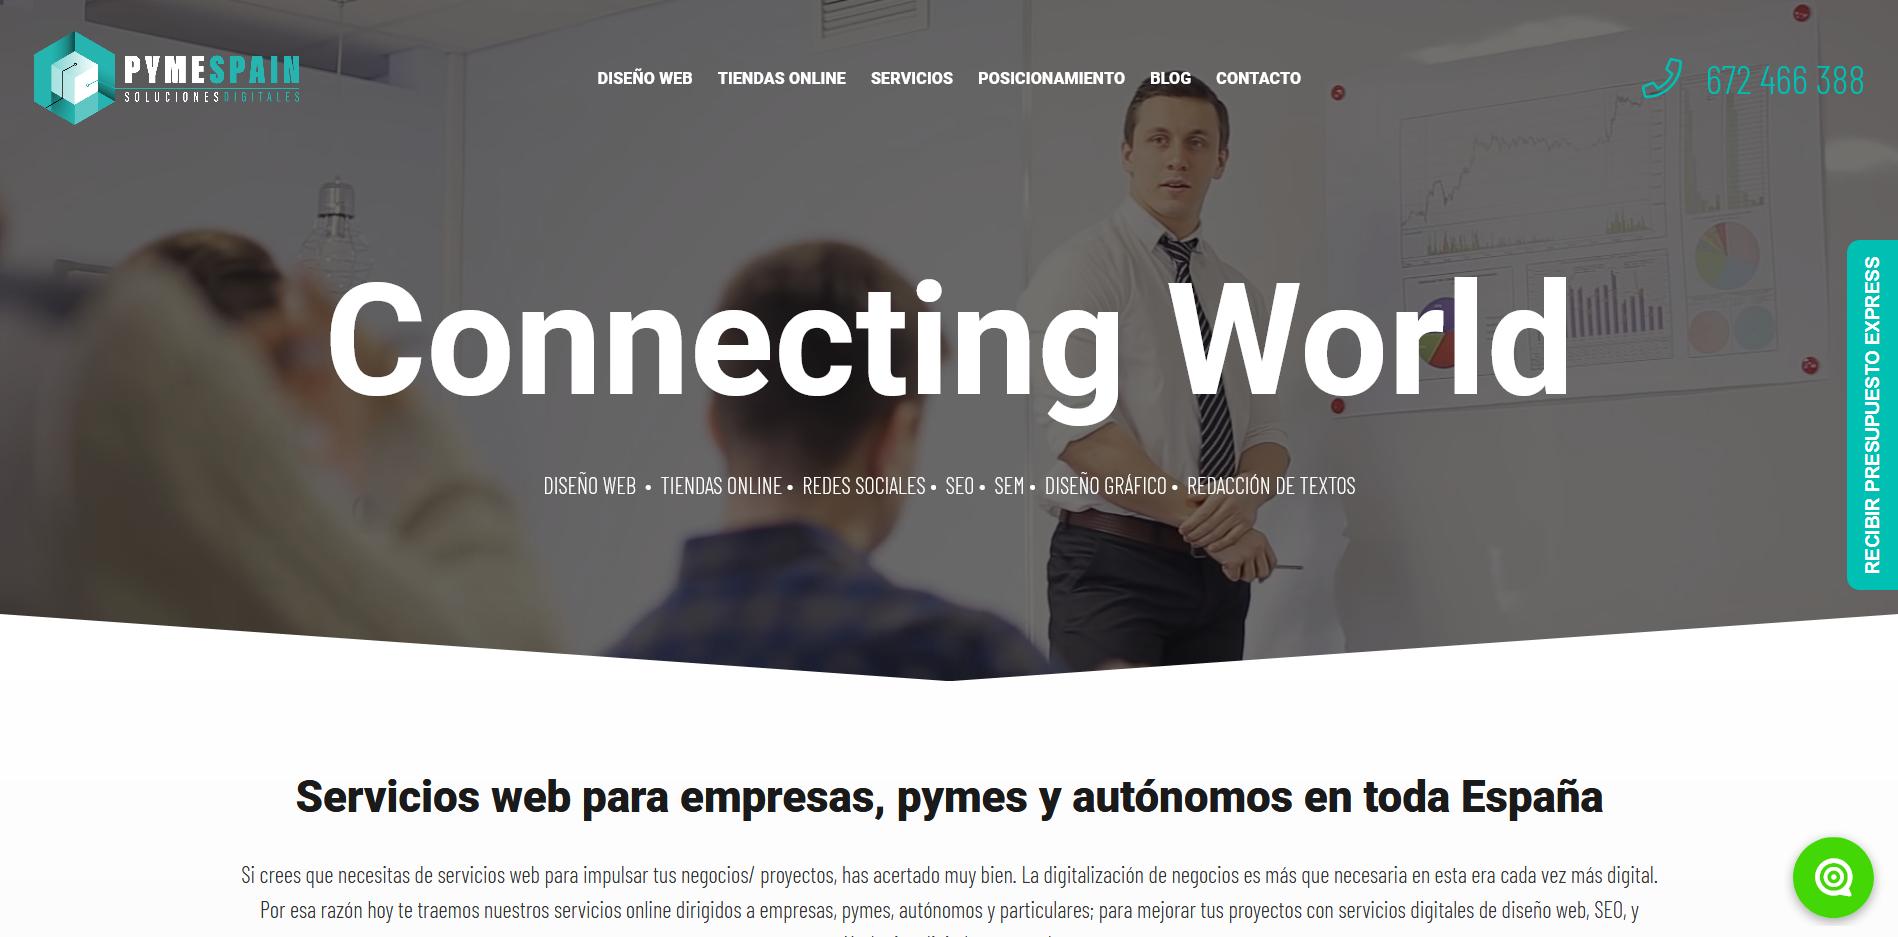 Agencia de Marketing digital - Pymes Spain Agencia